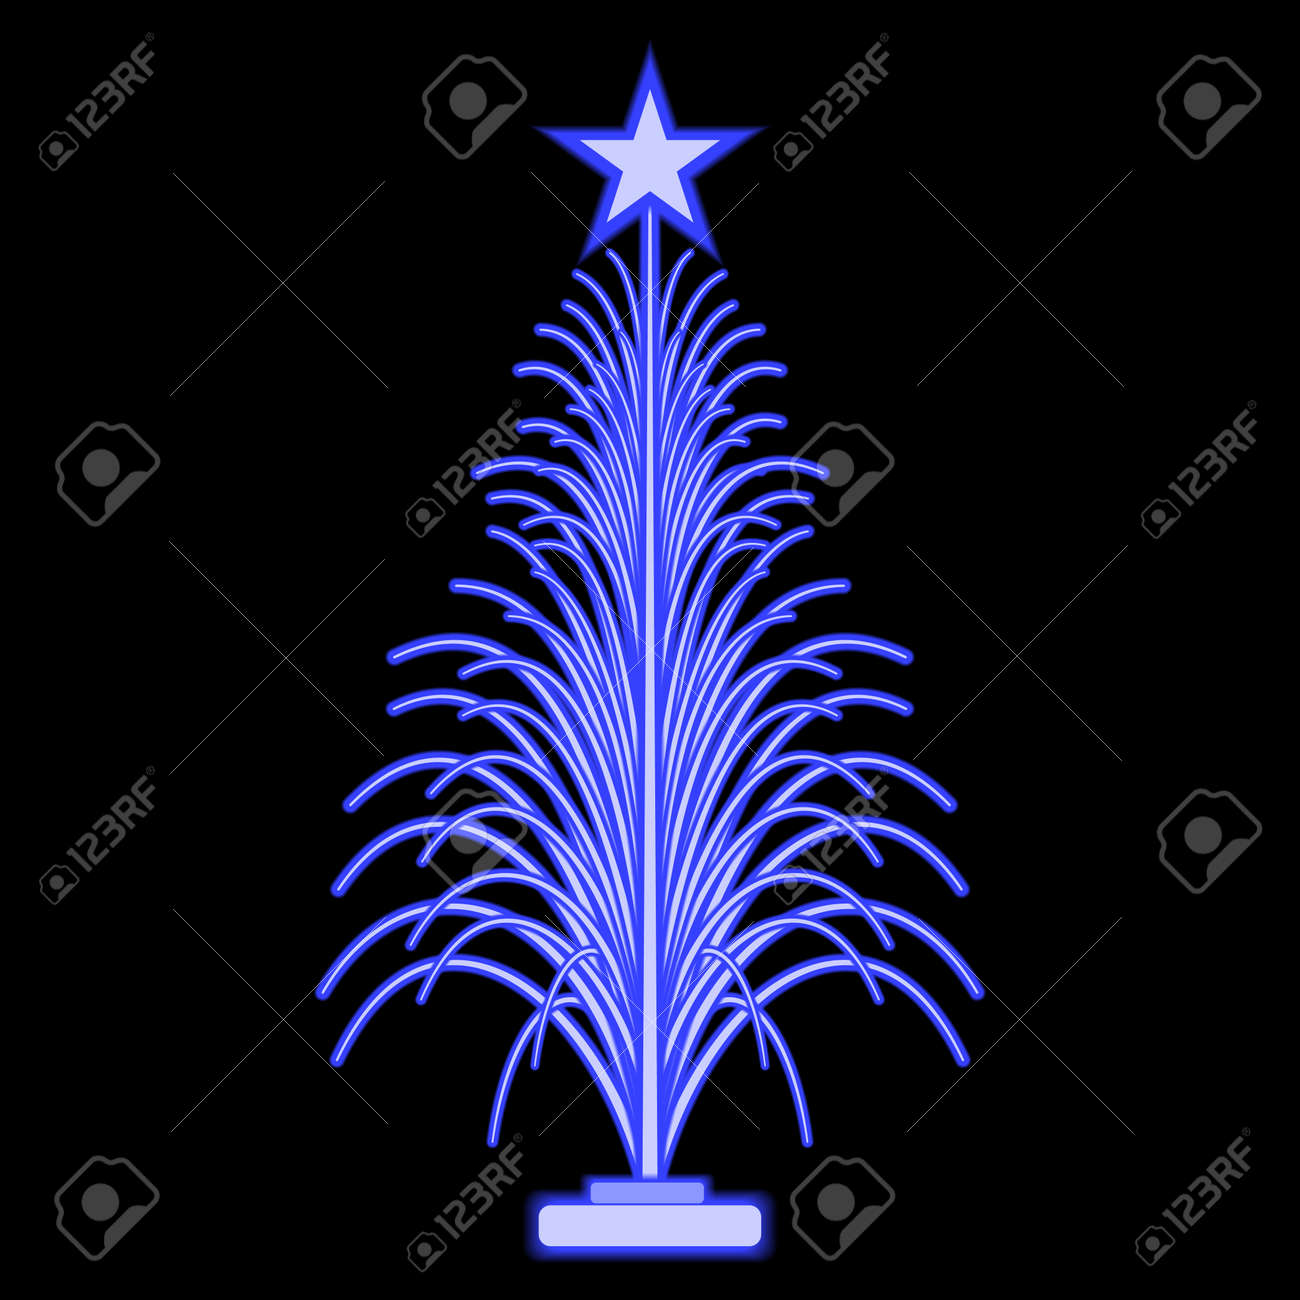 Fiber Optic Christmas Trees.Fiber Optic Christmas Tree With Star Vector Icon Isolated On